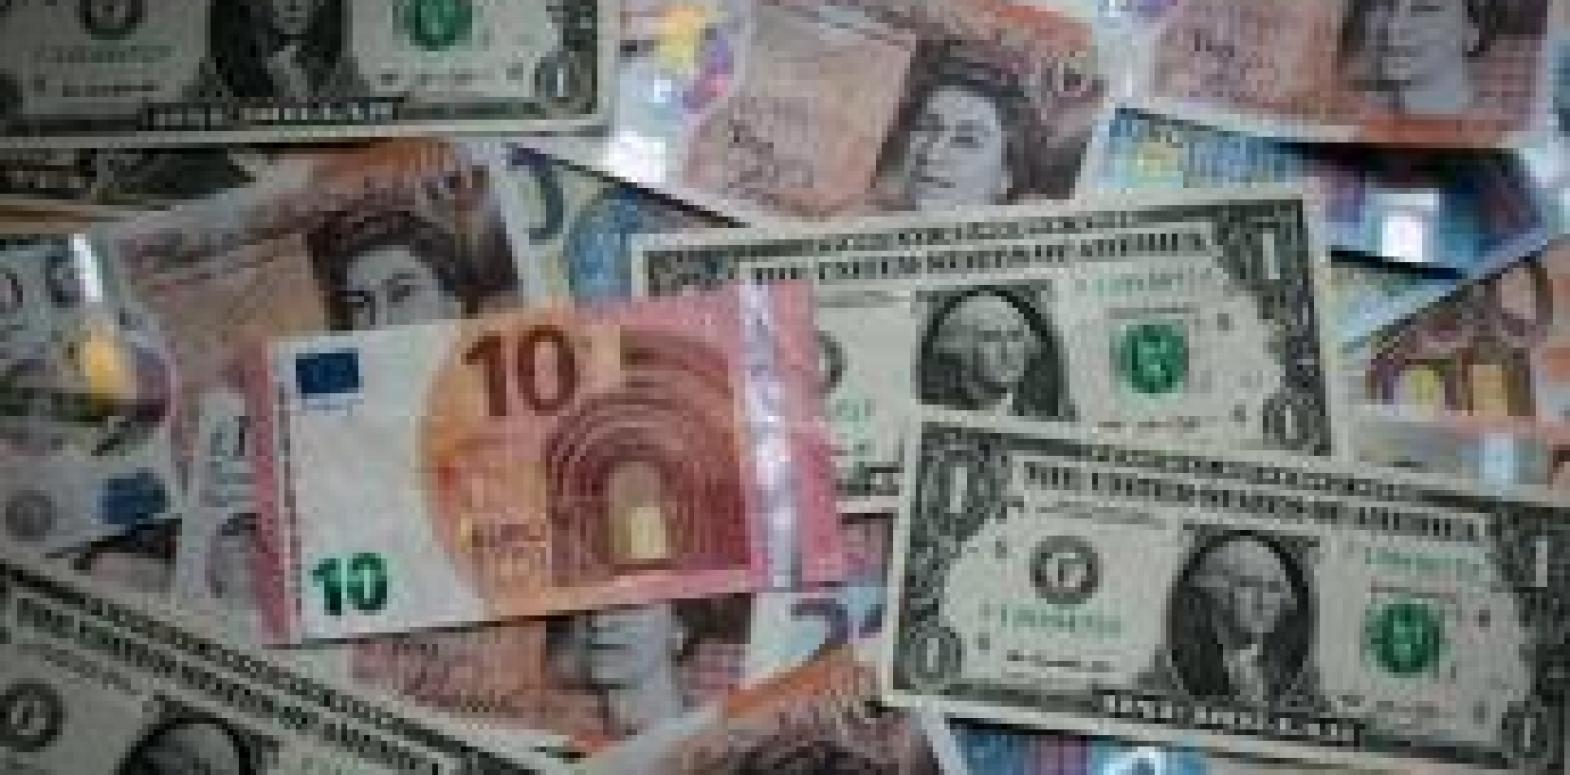 Курс НБУ на 27 марта: доллар - 28,13 грн, евро - 30,86 грн